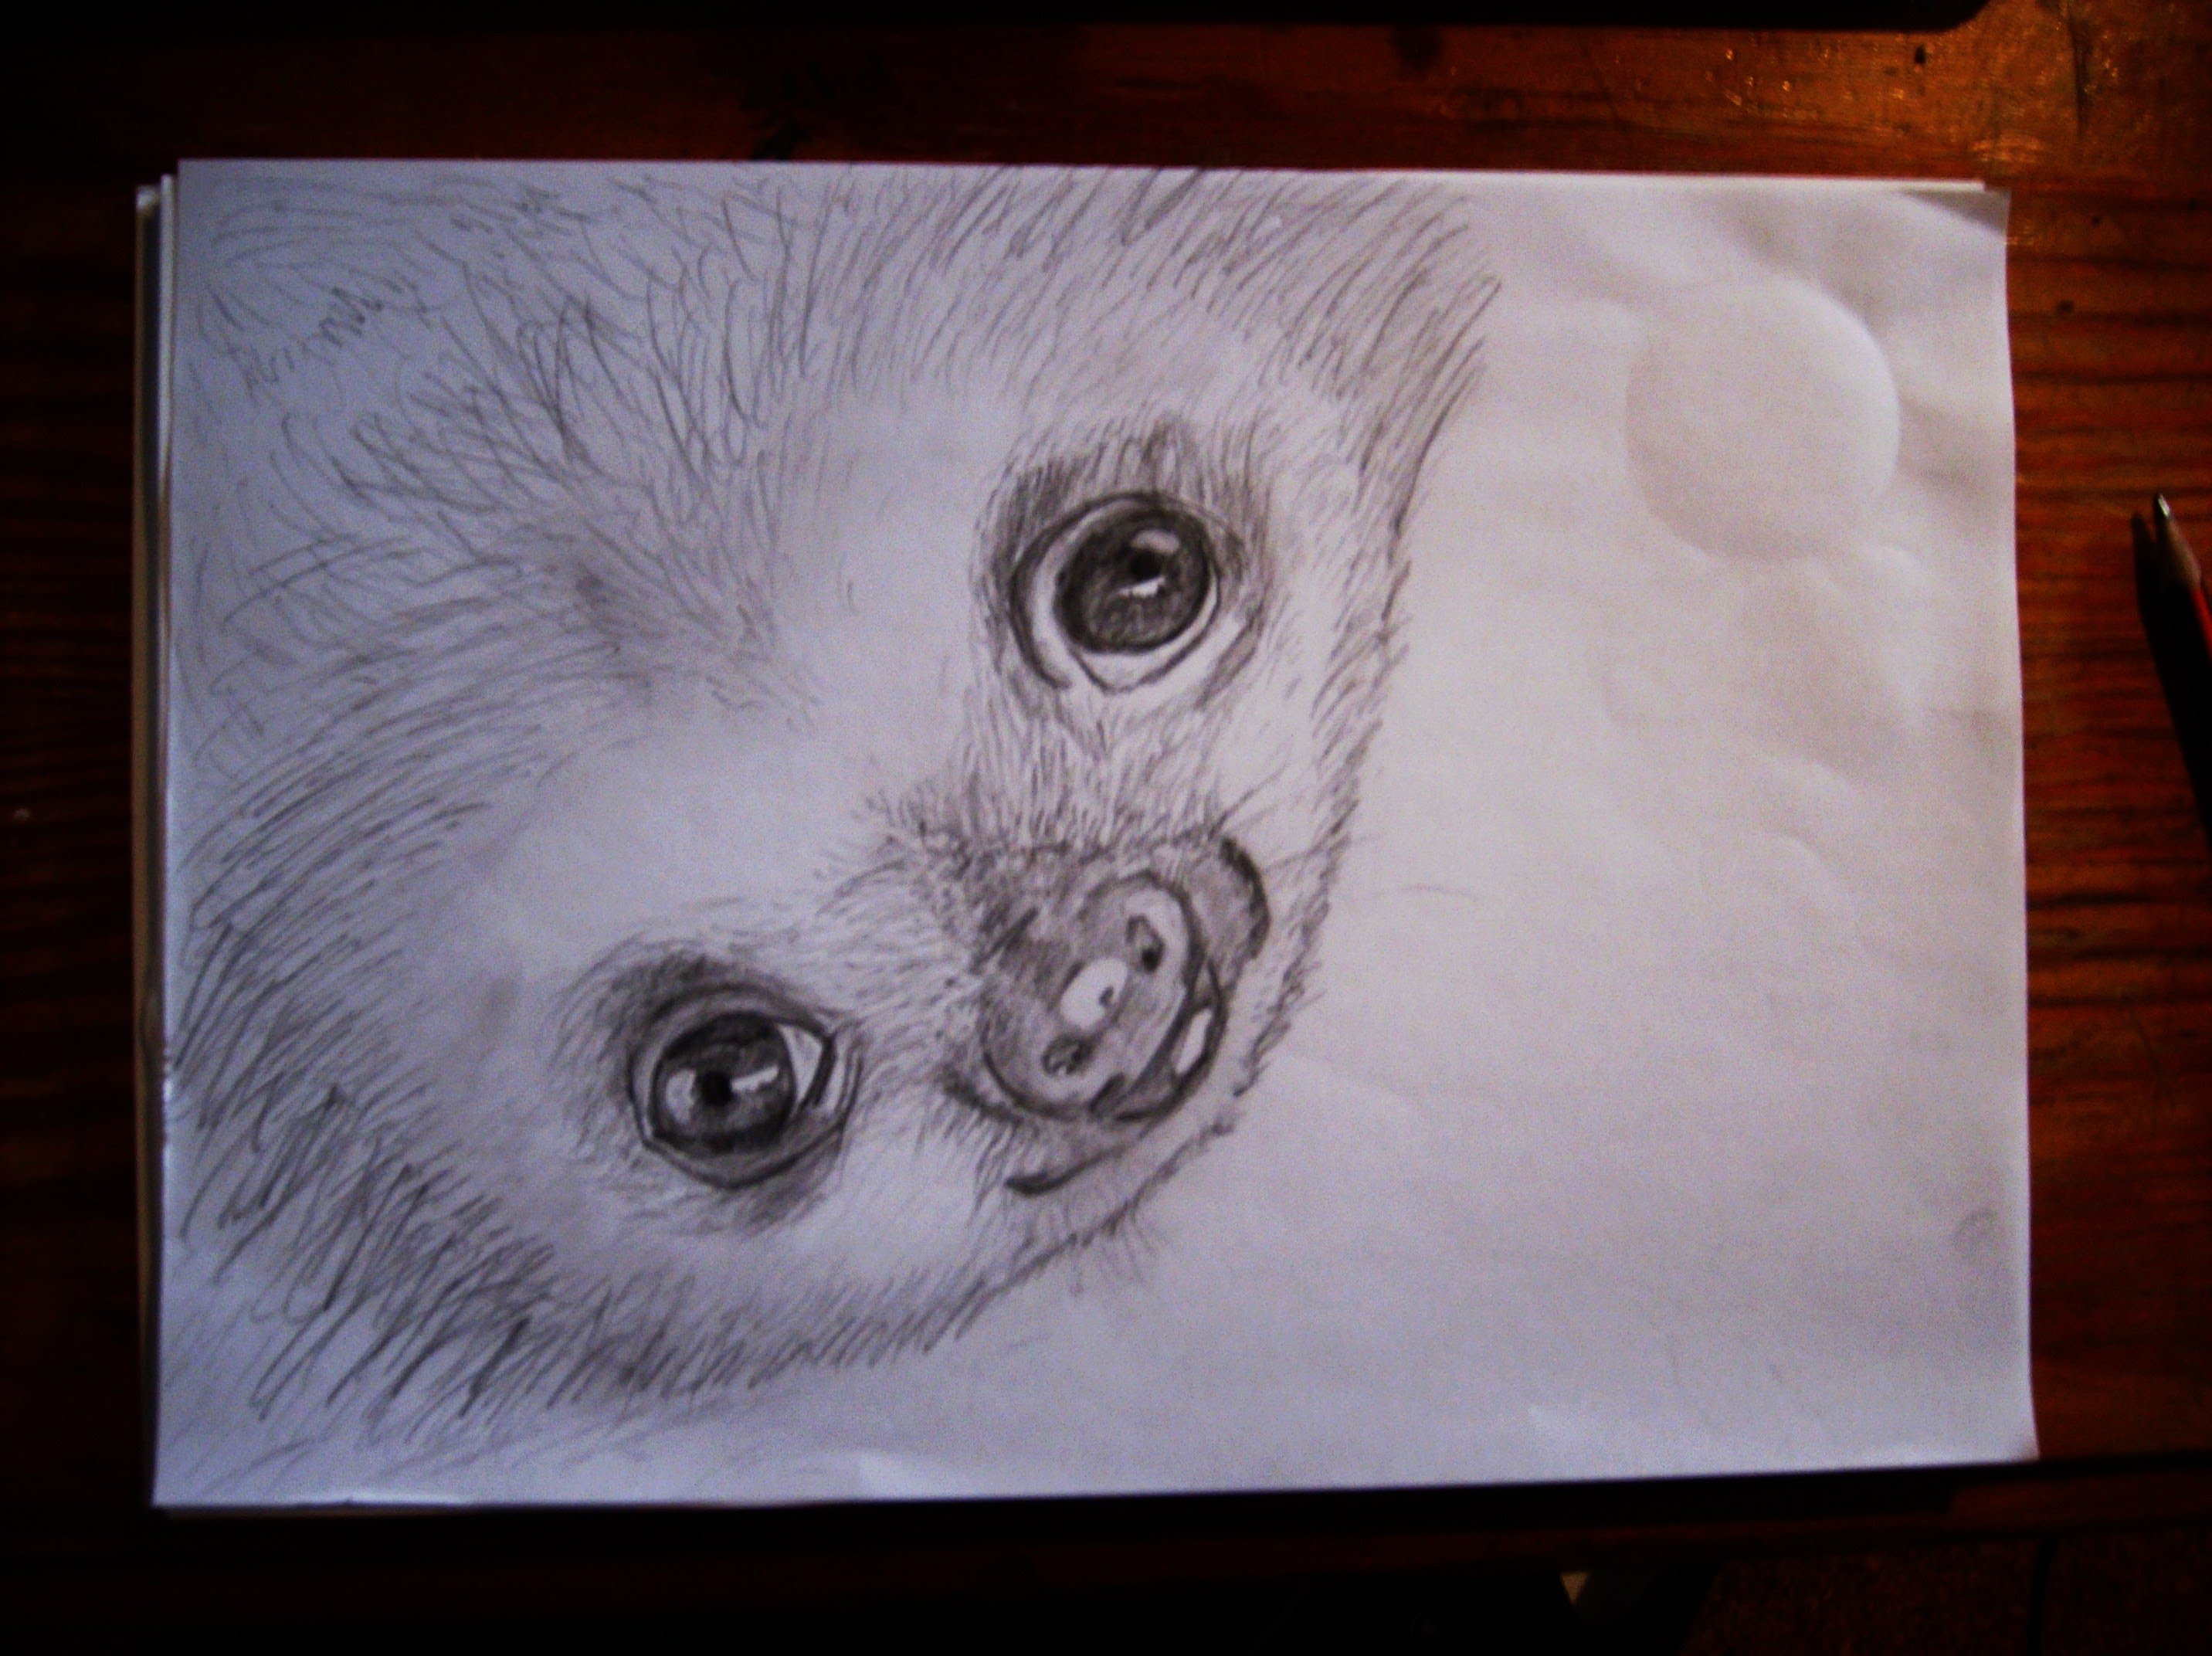 Drawn sloth baby sloth Baby Sloth YouTube speed Sloth